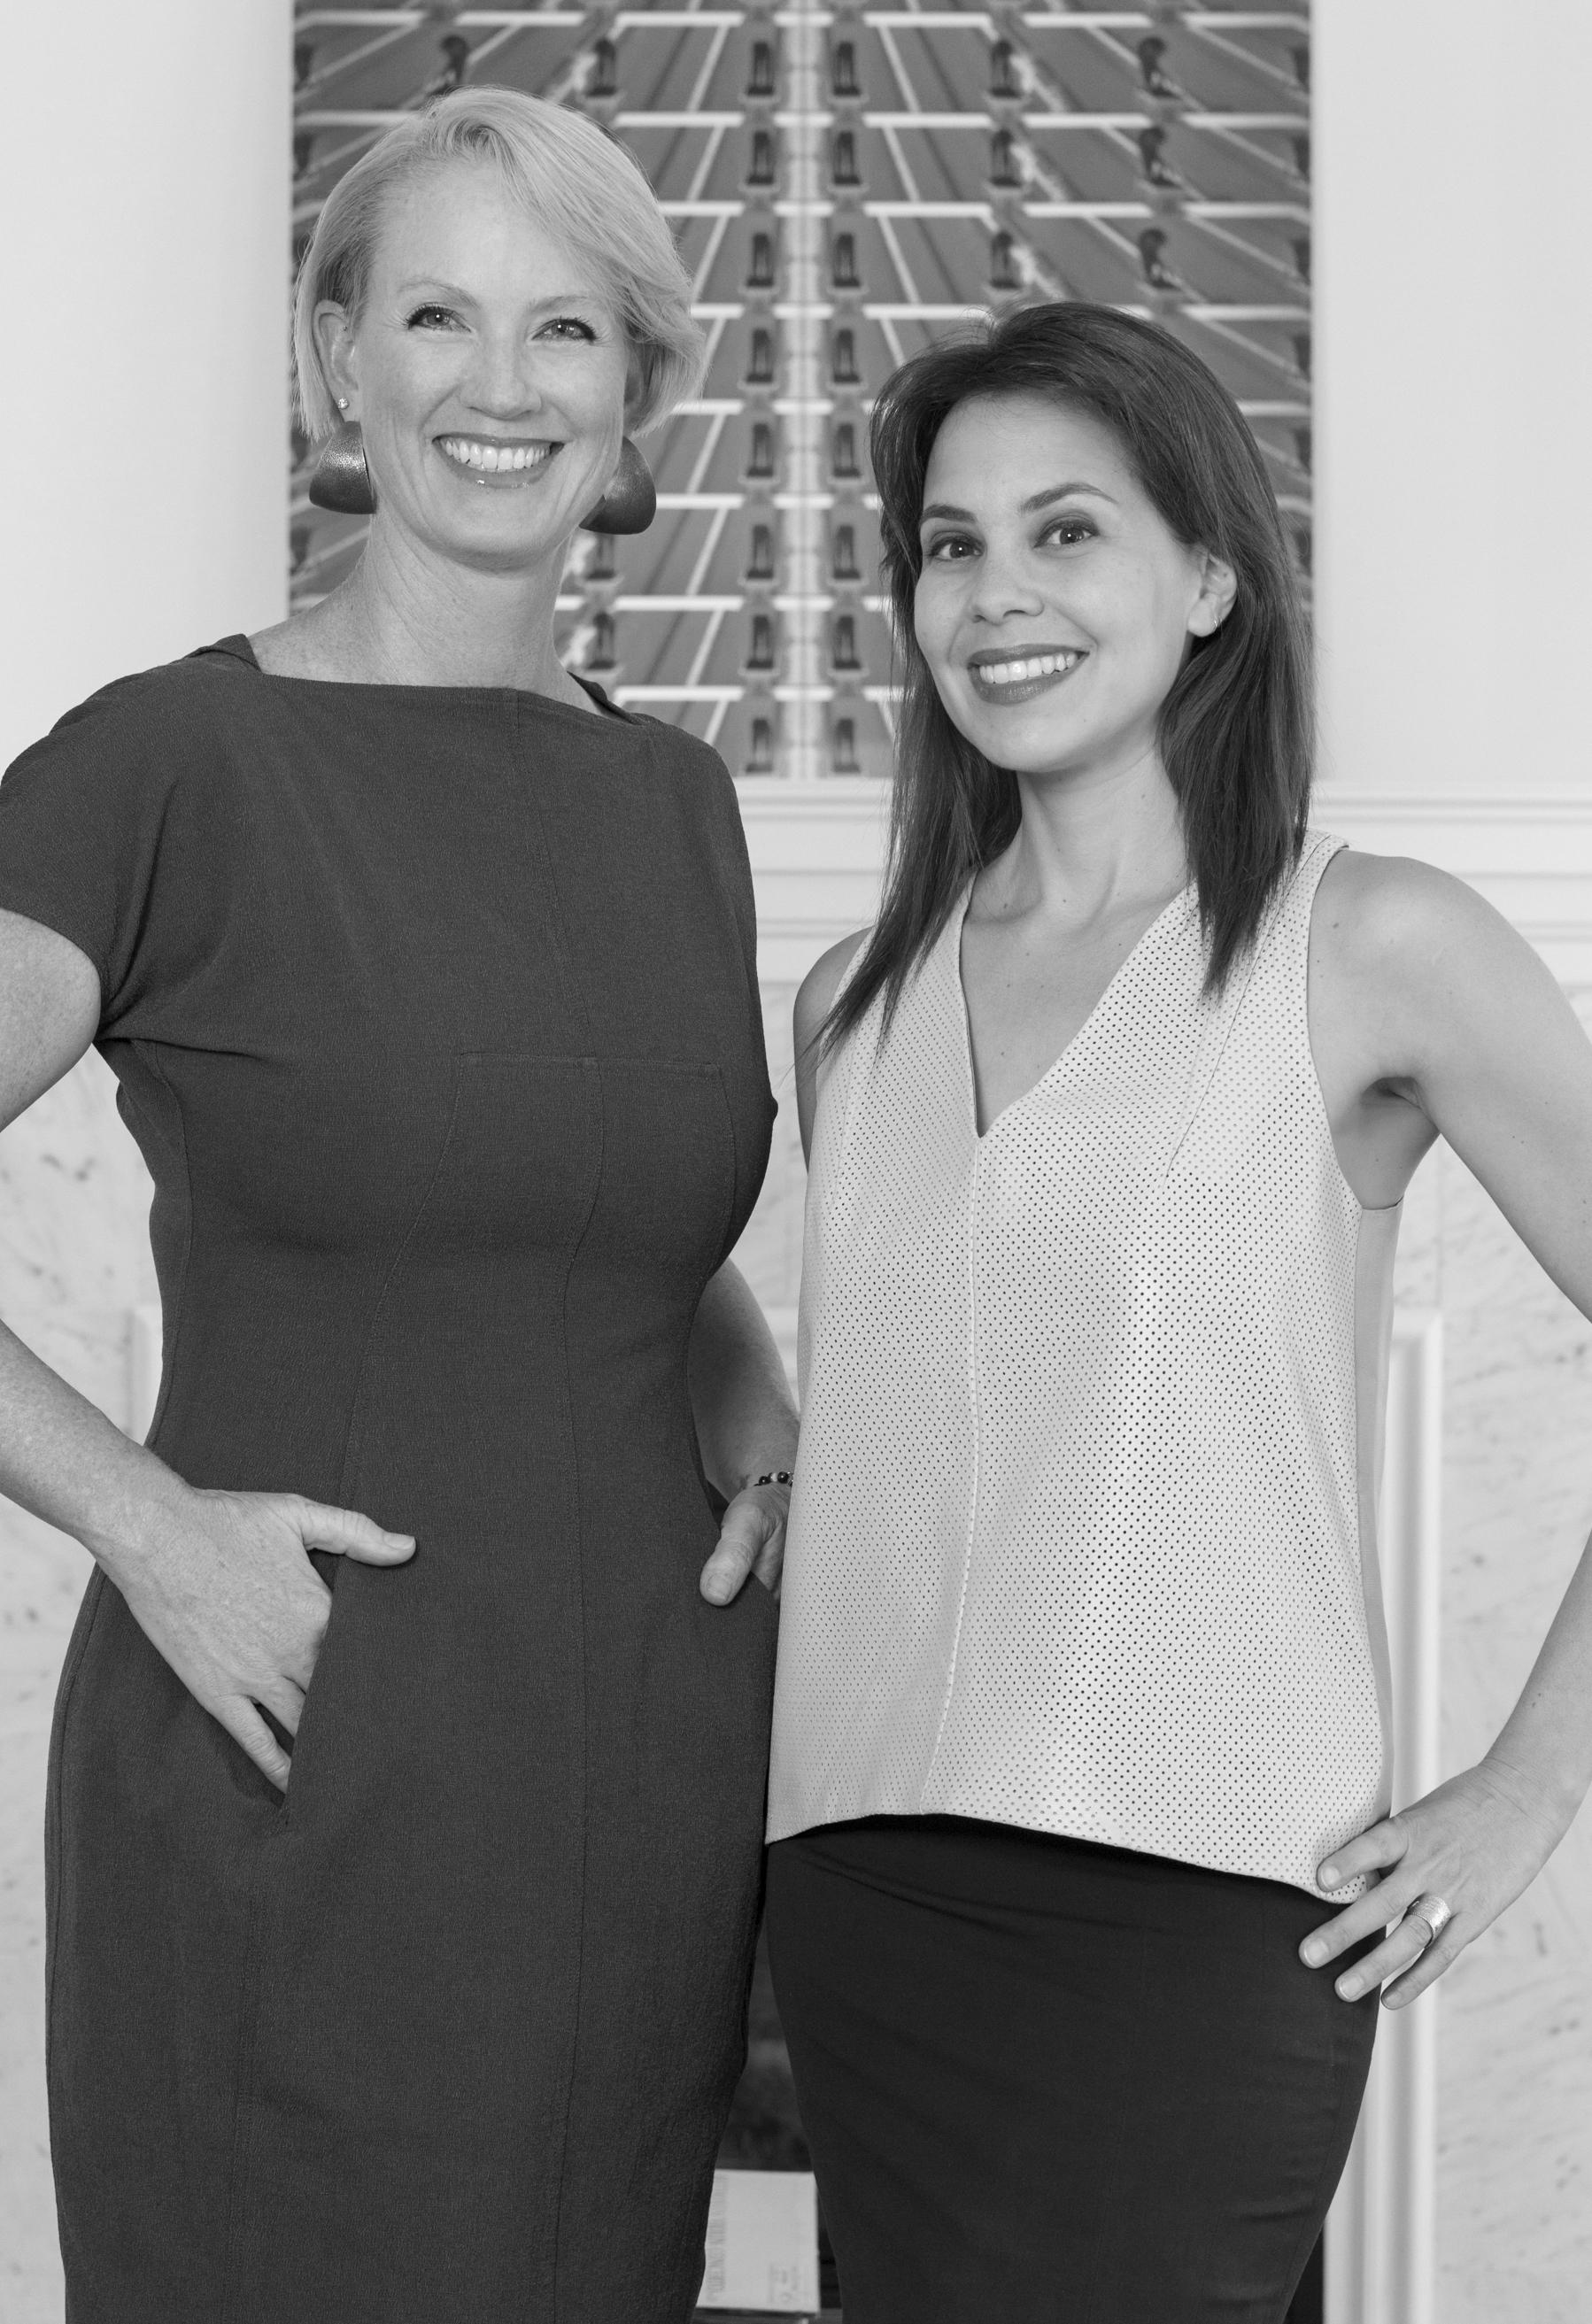 The Art of Change Co-Founders Karen DeTemple and Nicole Polletta Portrait